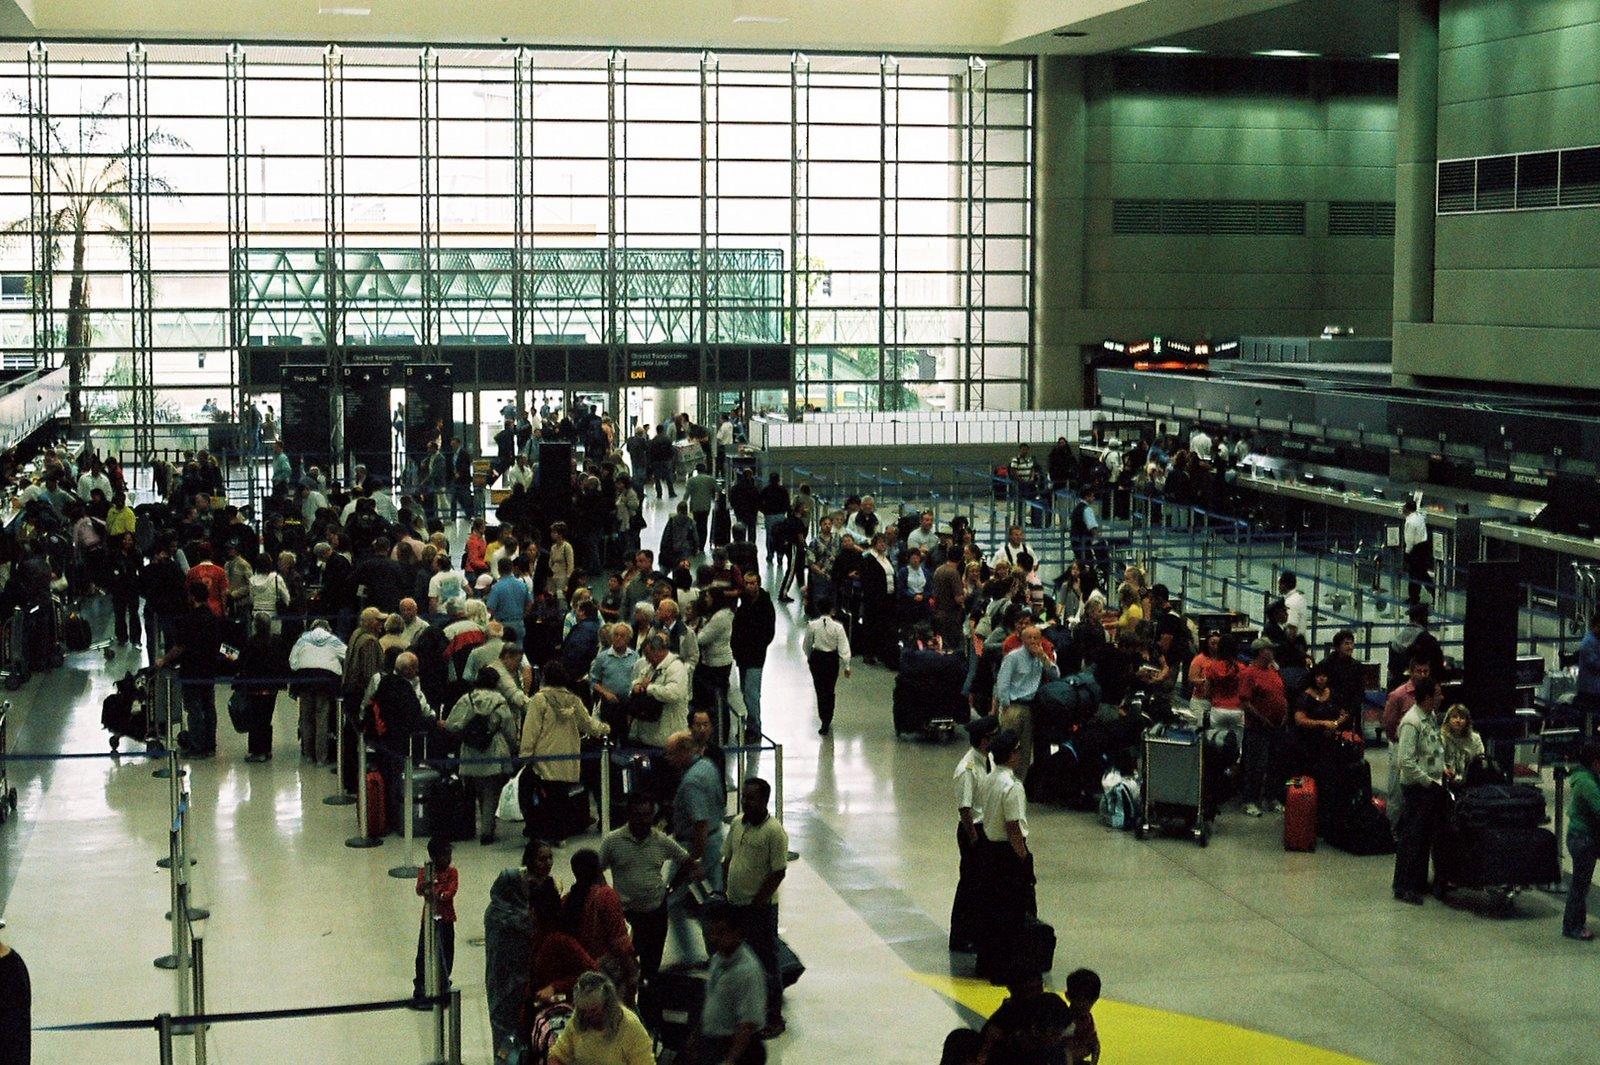 Peruvians Return from Abroad to Peru -- the exodus begins